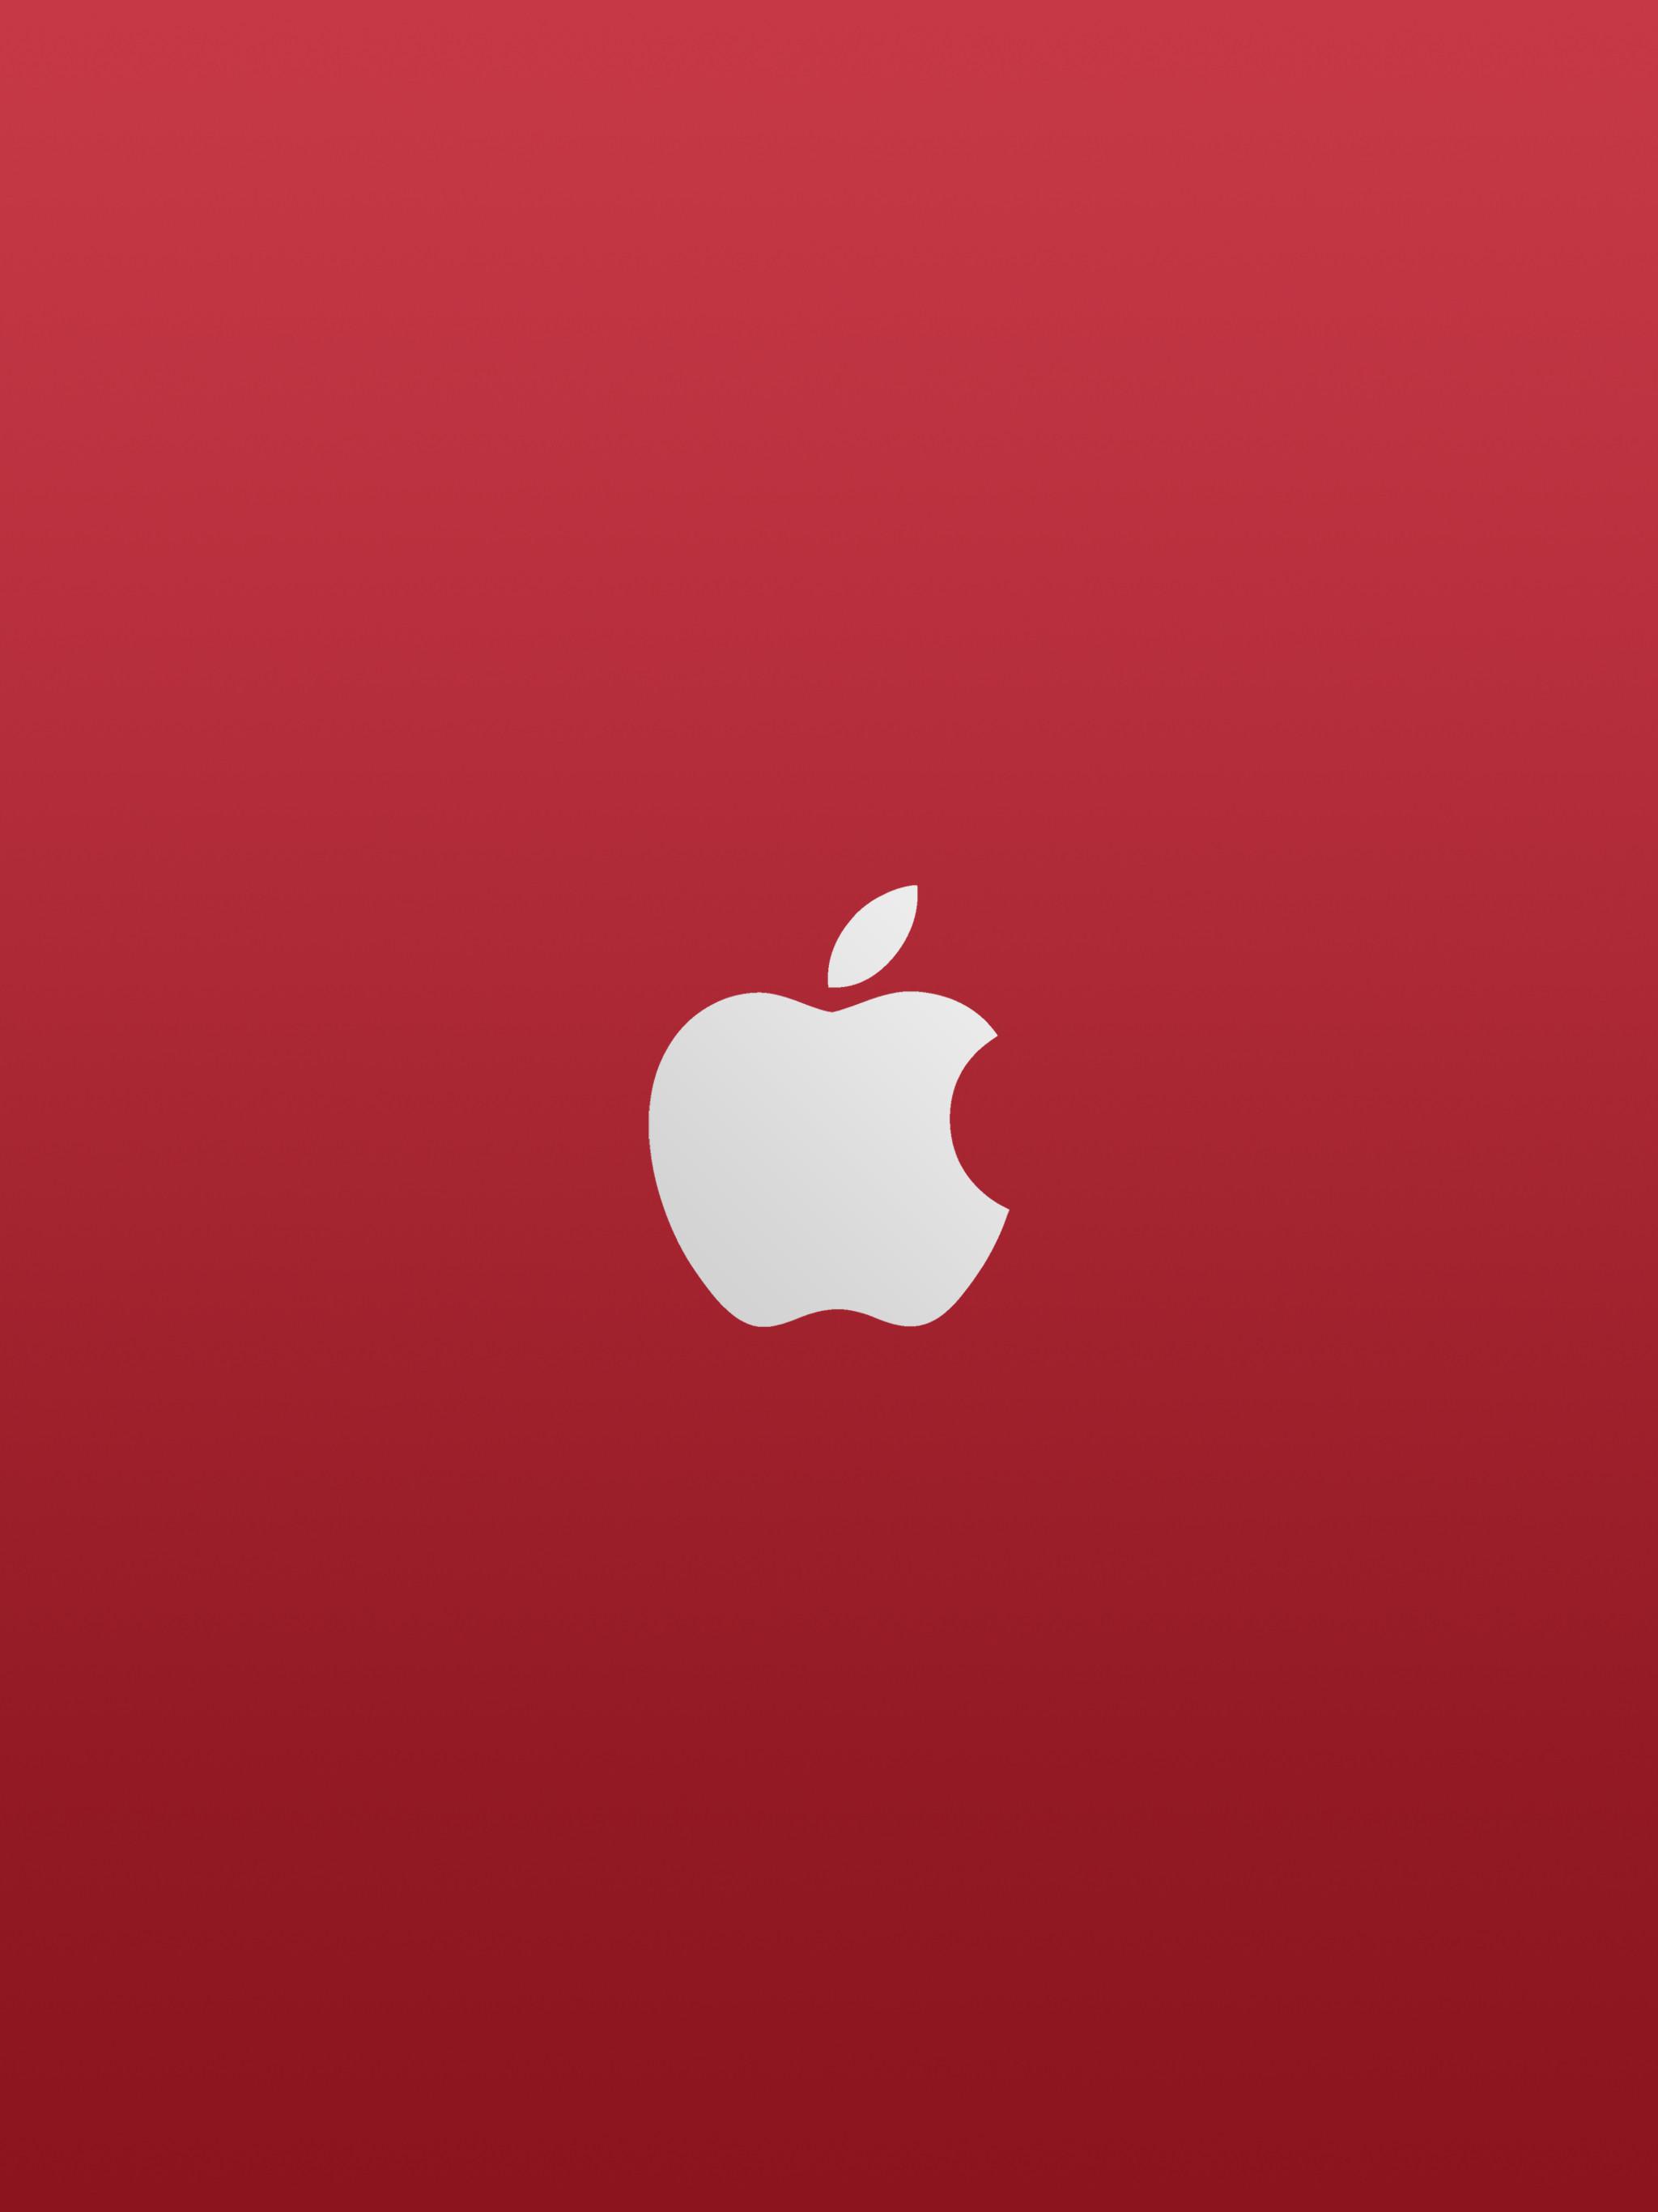 WoowPaper Apple Iphone Wallpaper Hd Download